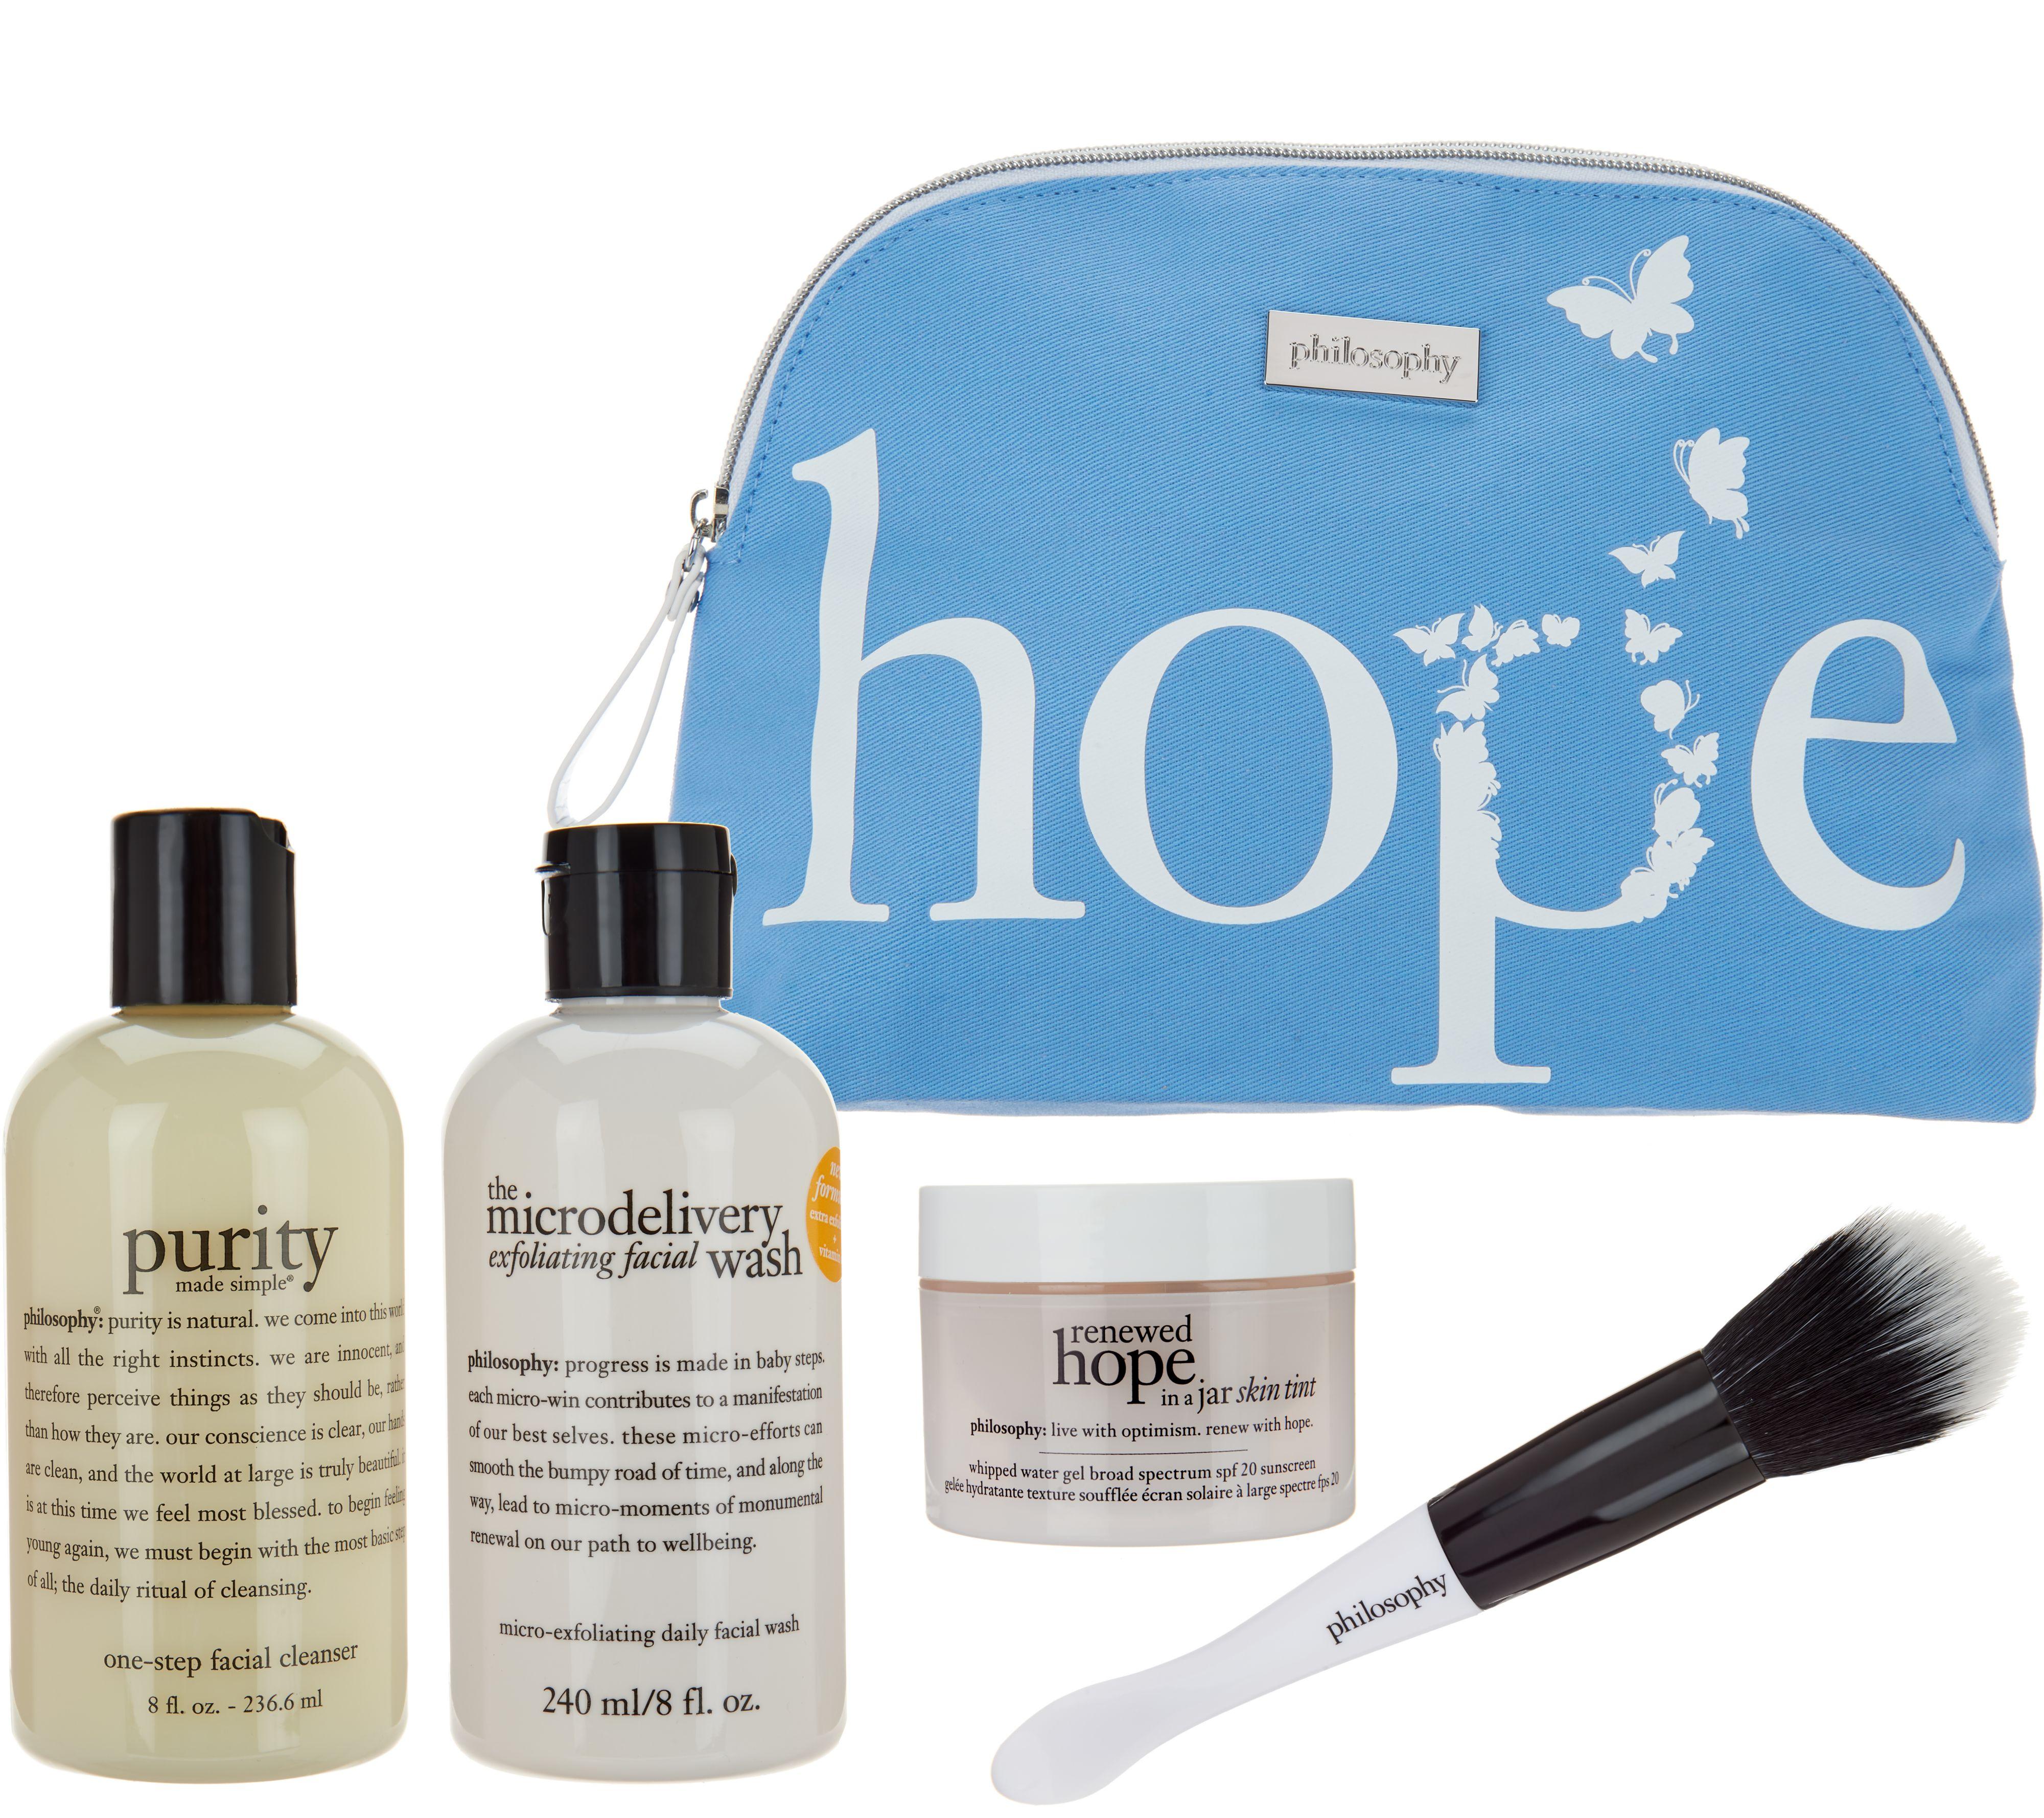 New customer qvc promo code - Philosophy Festive Flawless Skincare Kit A302964